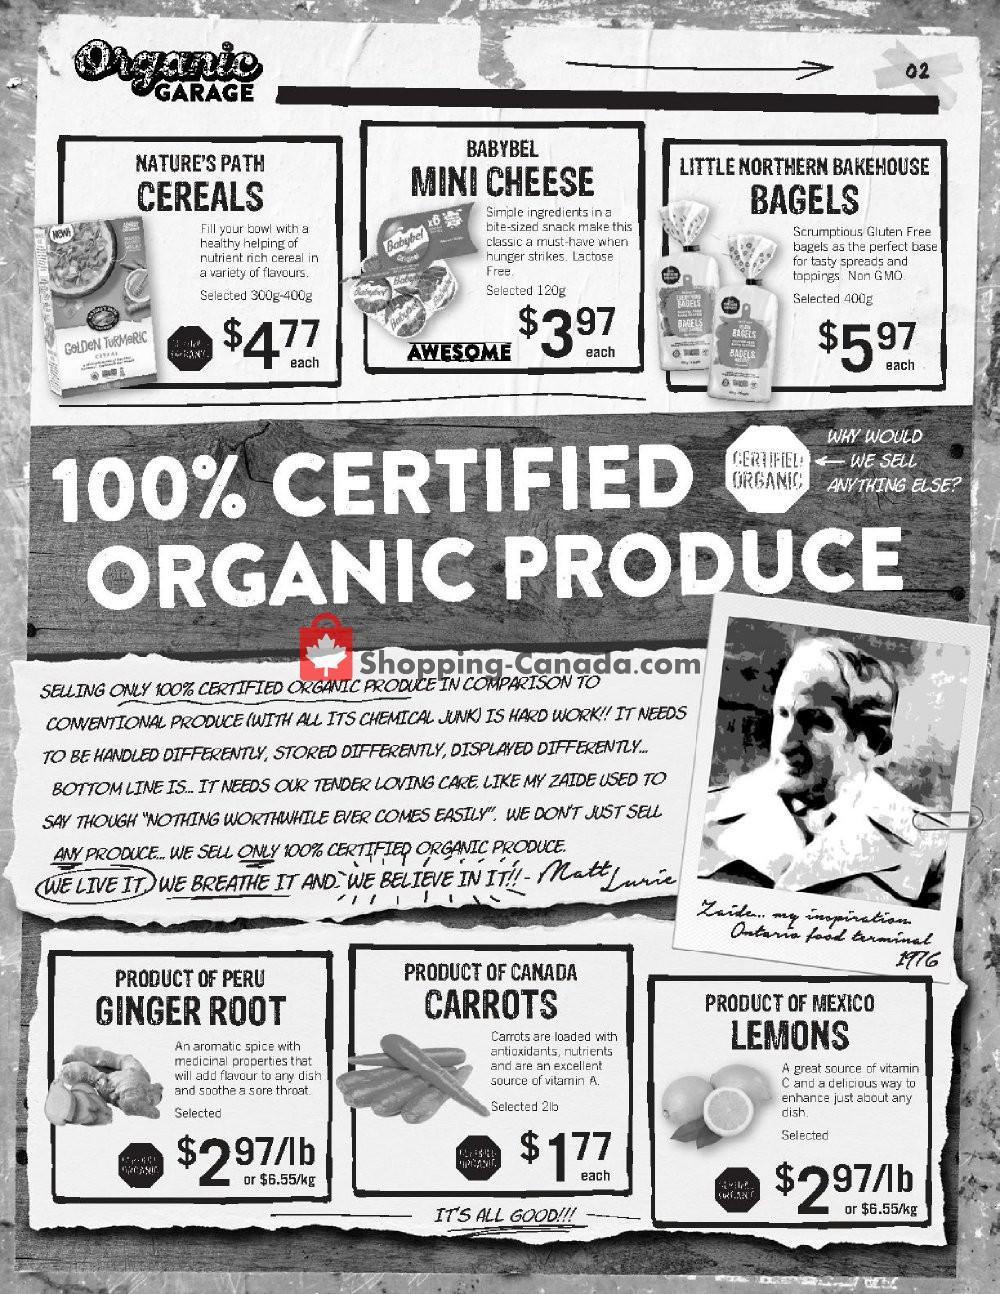 Flyer Organic Garage Canada - from Wednesday November 6, 2019 to Wednesday November 20, 2019